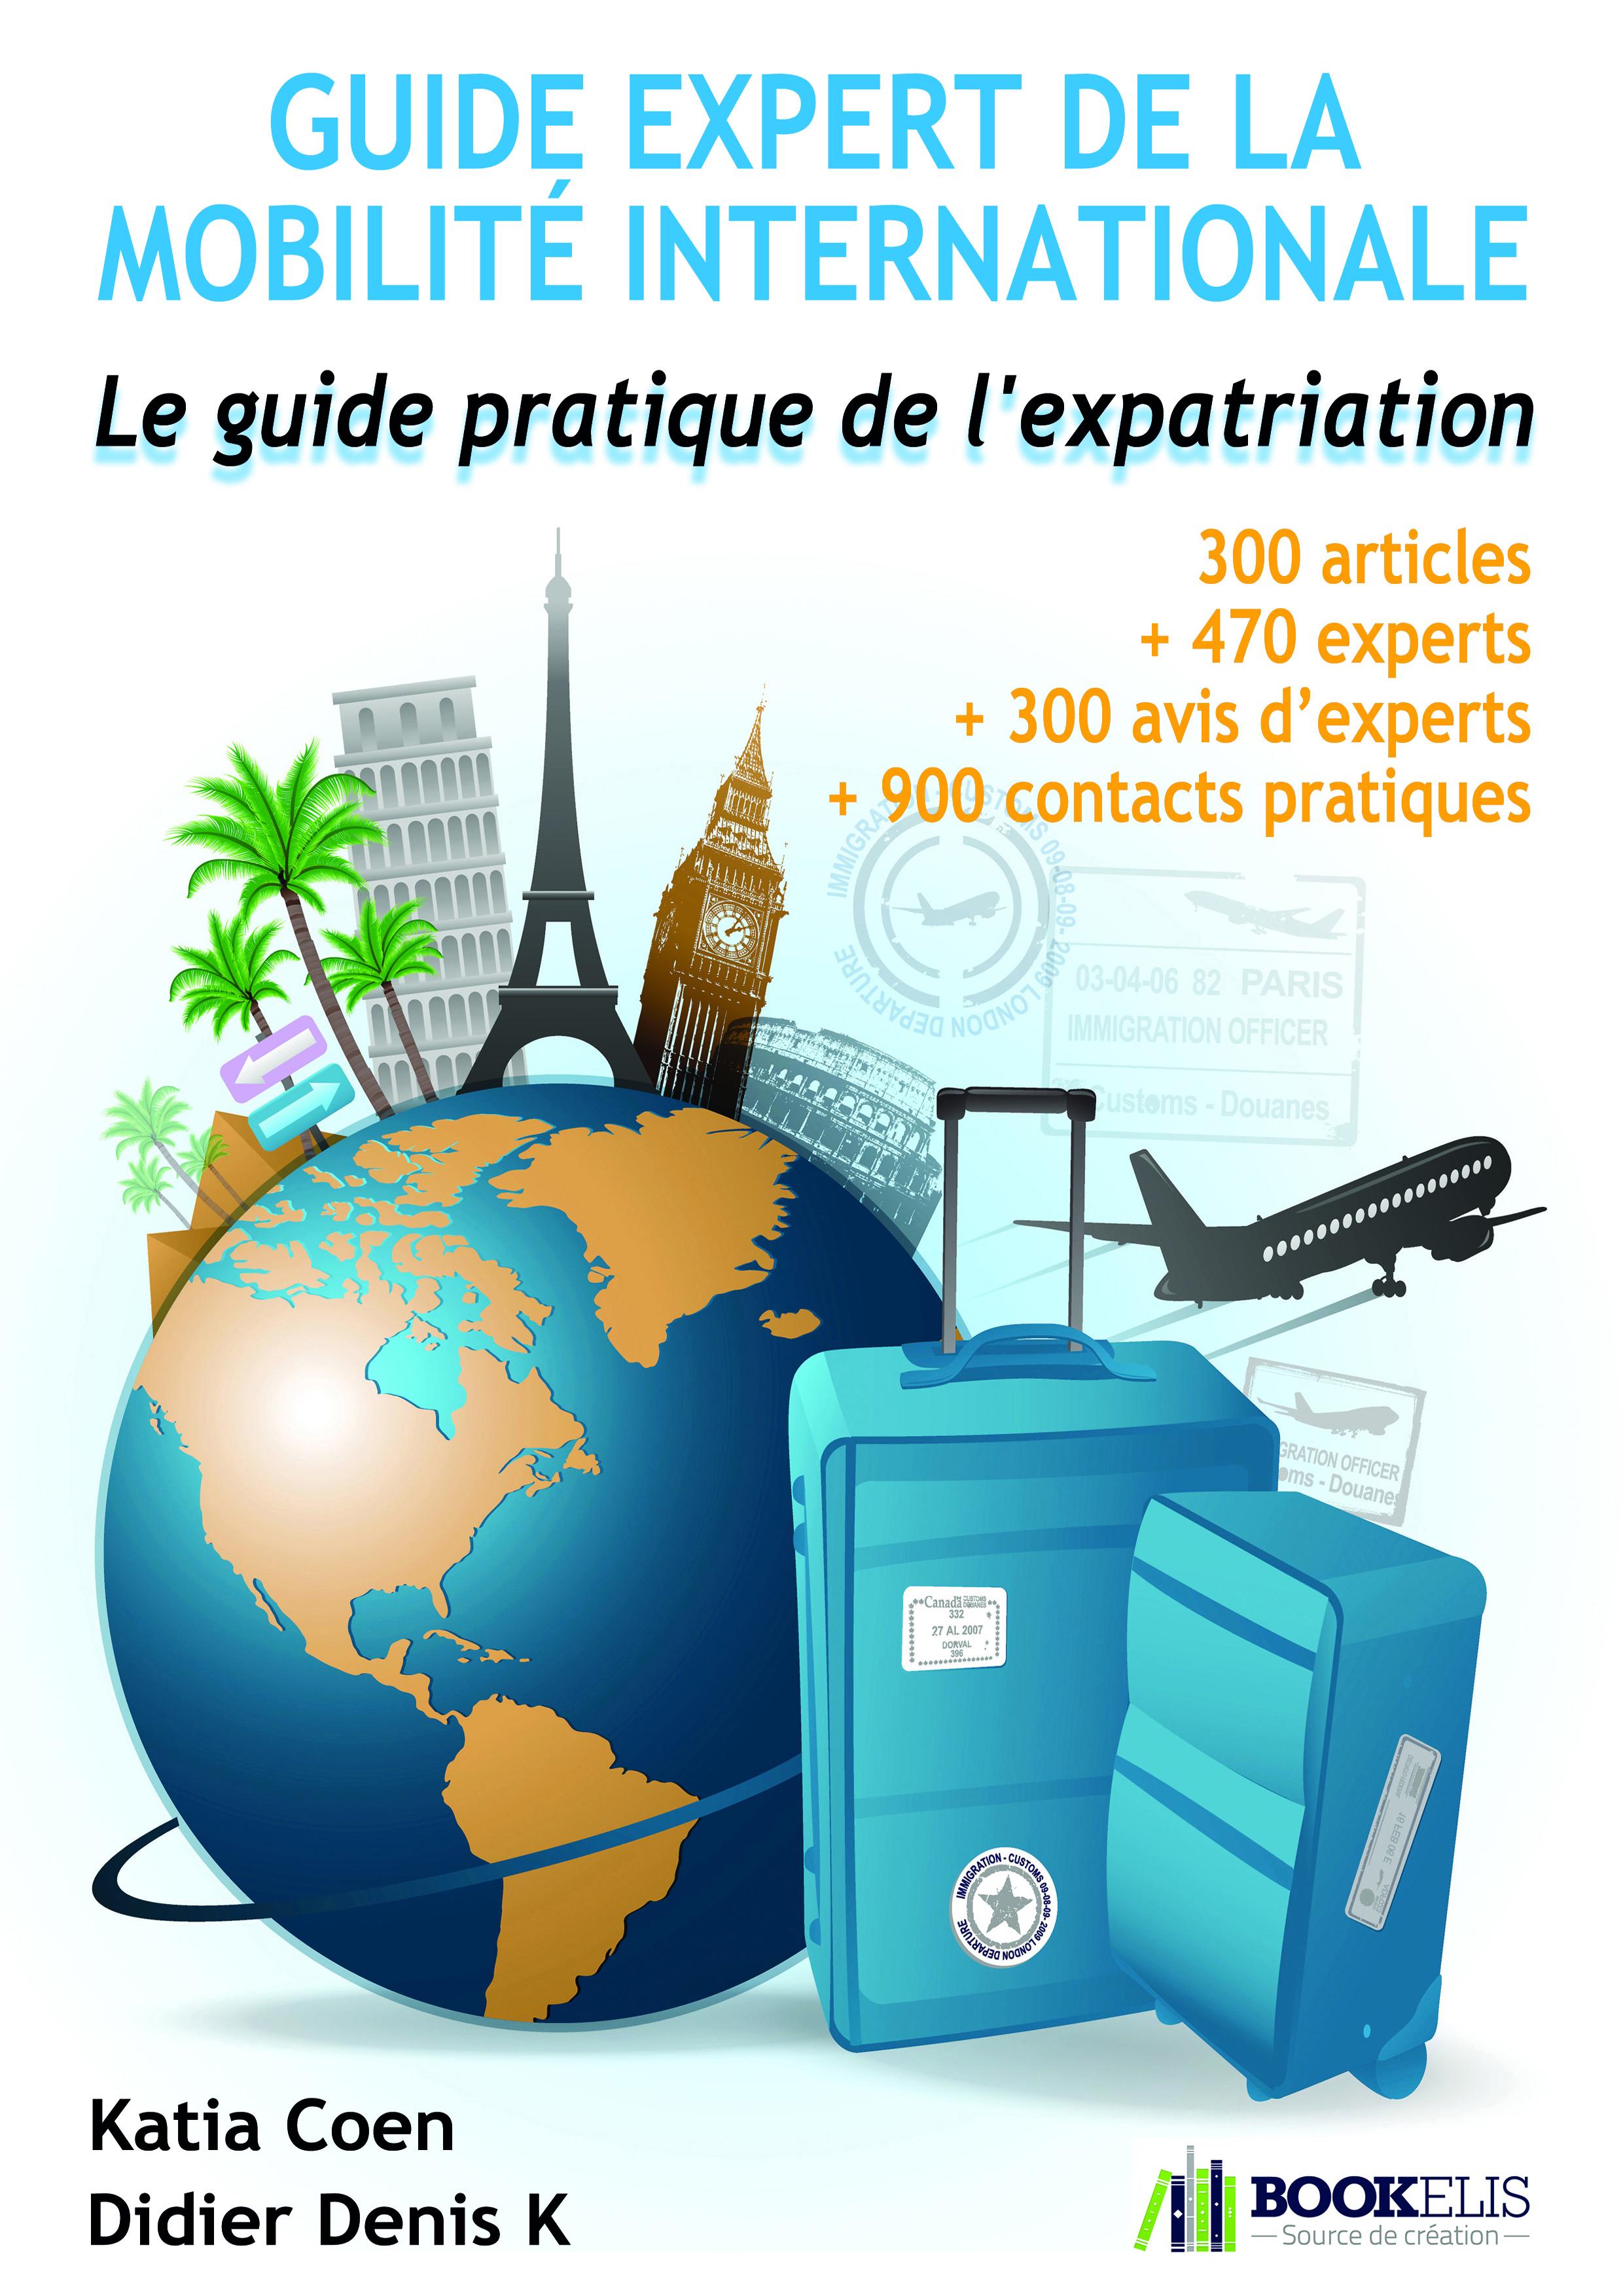 GUIDE EXPERT DE LA MOBILITE INTERNATIONALE